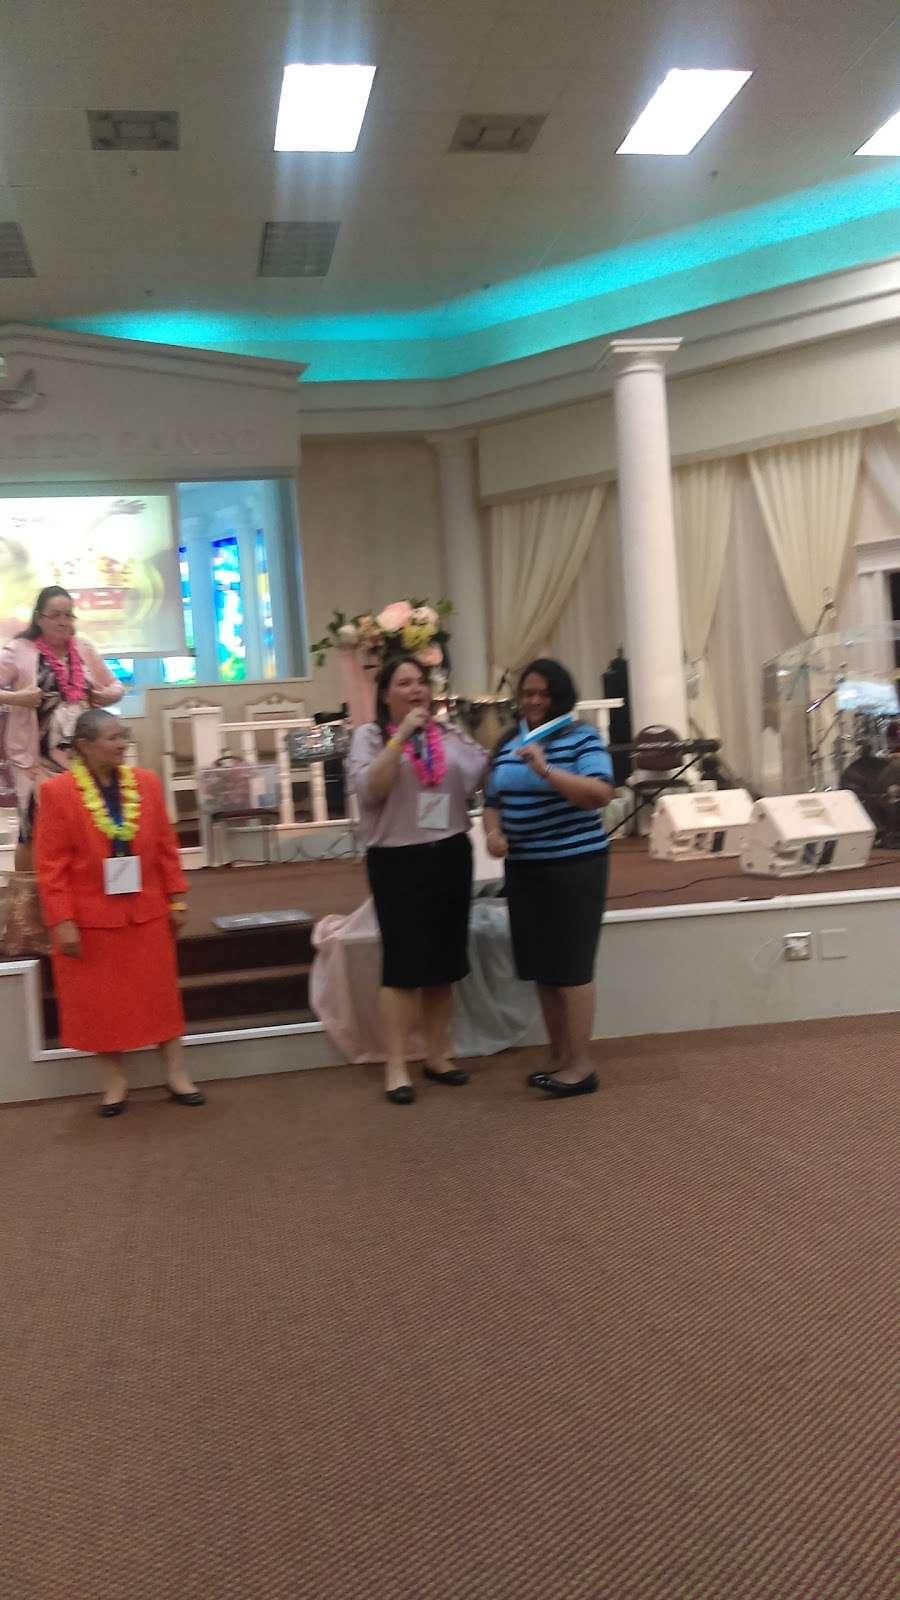 Iglesia de DIOS Pentecostal Movimiento internacional - church  | Photo 4 of 6 | Address: 3225 S Goldenrod Rd, Orlando, FL 32822, USA